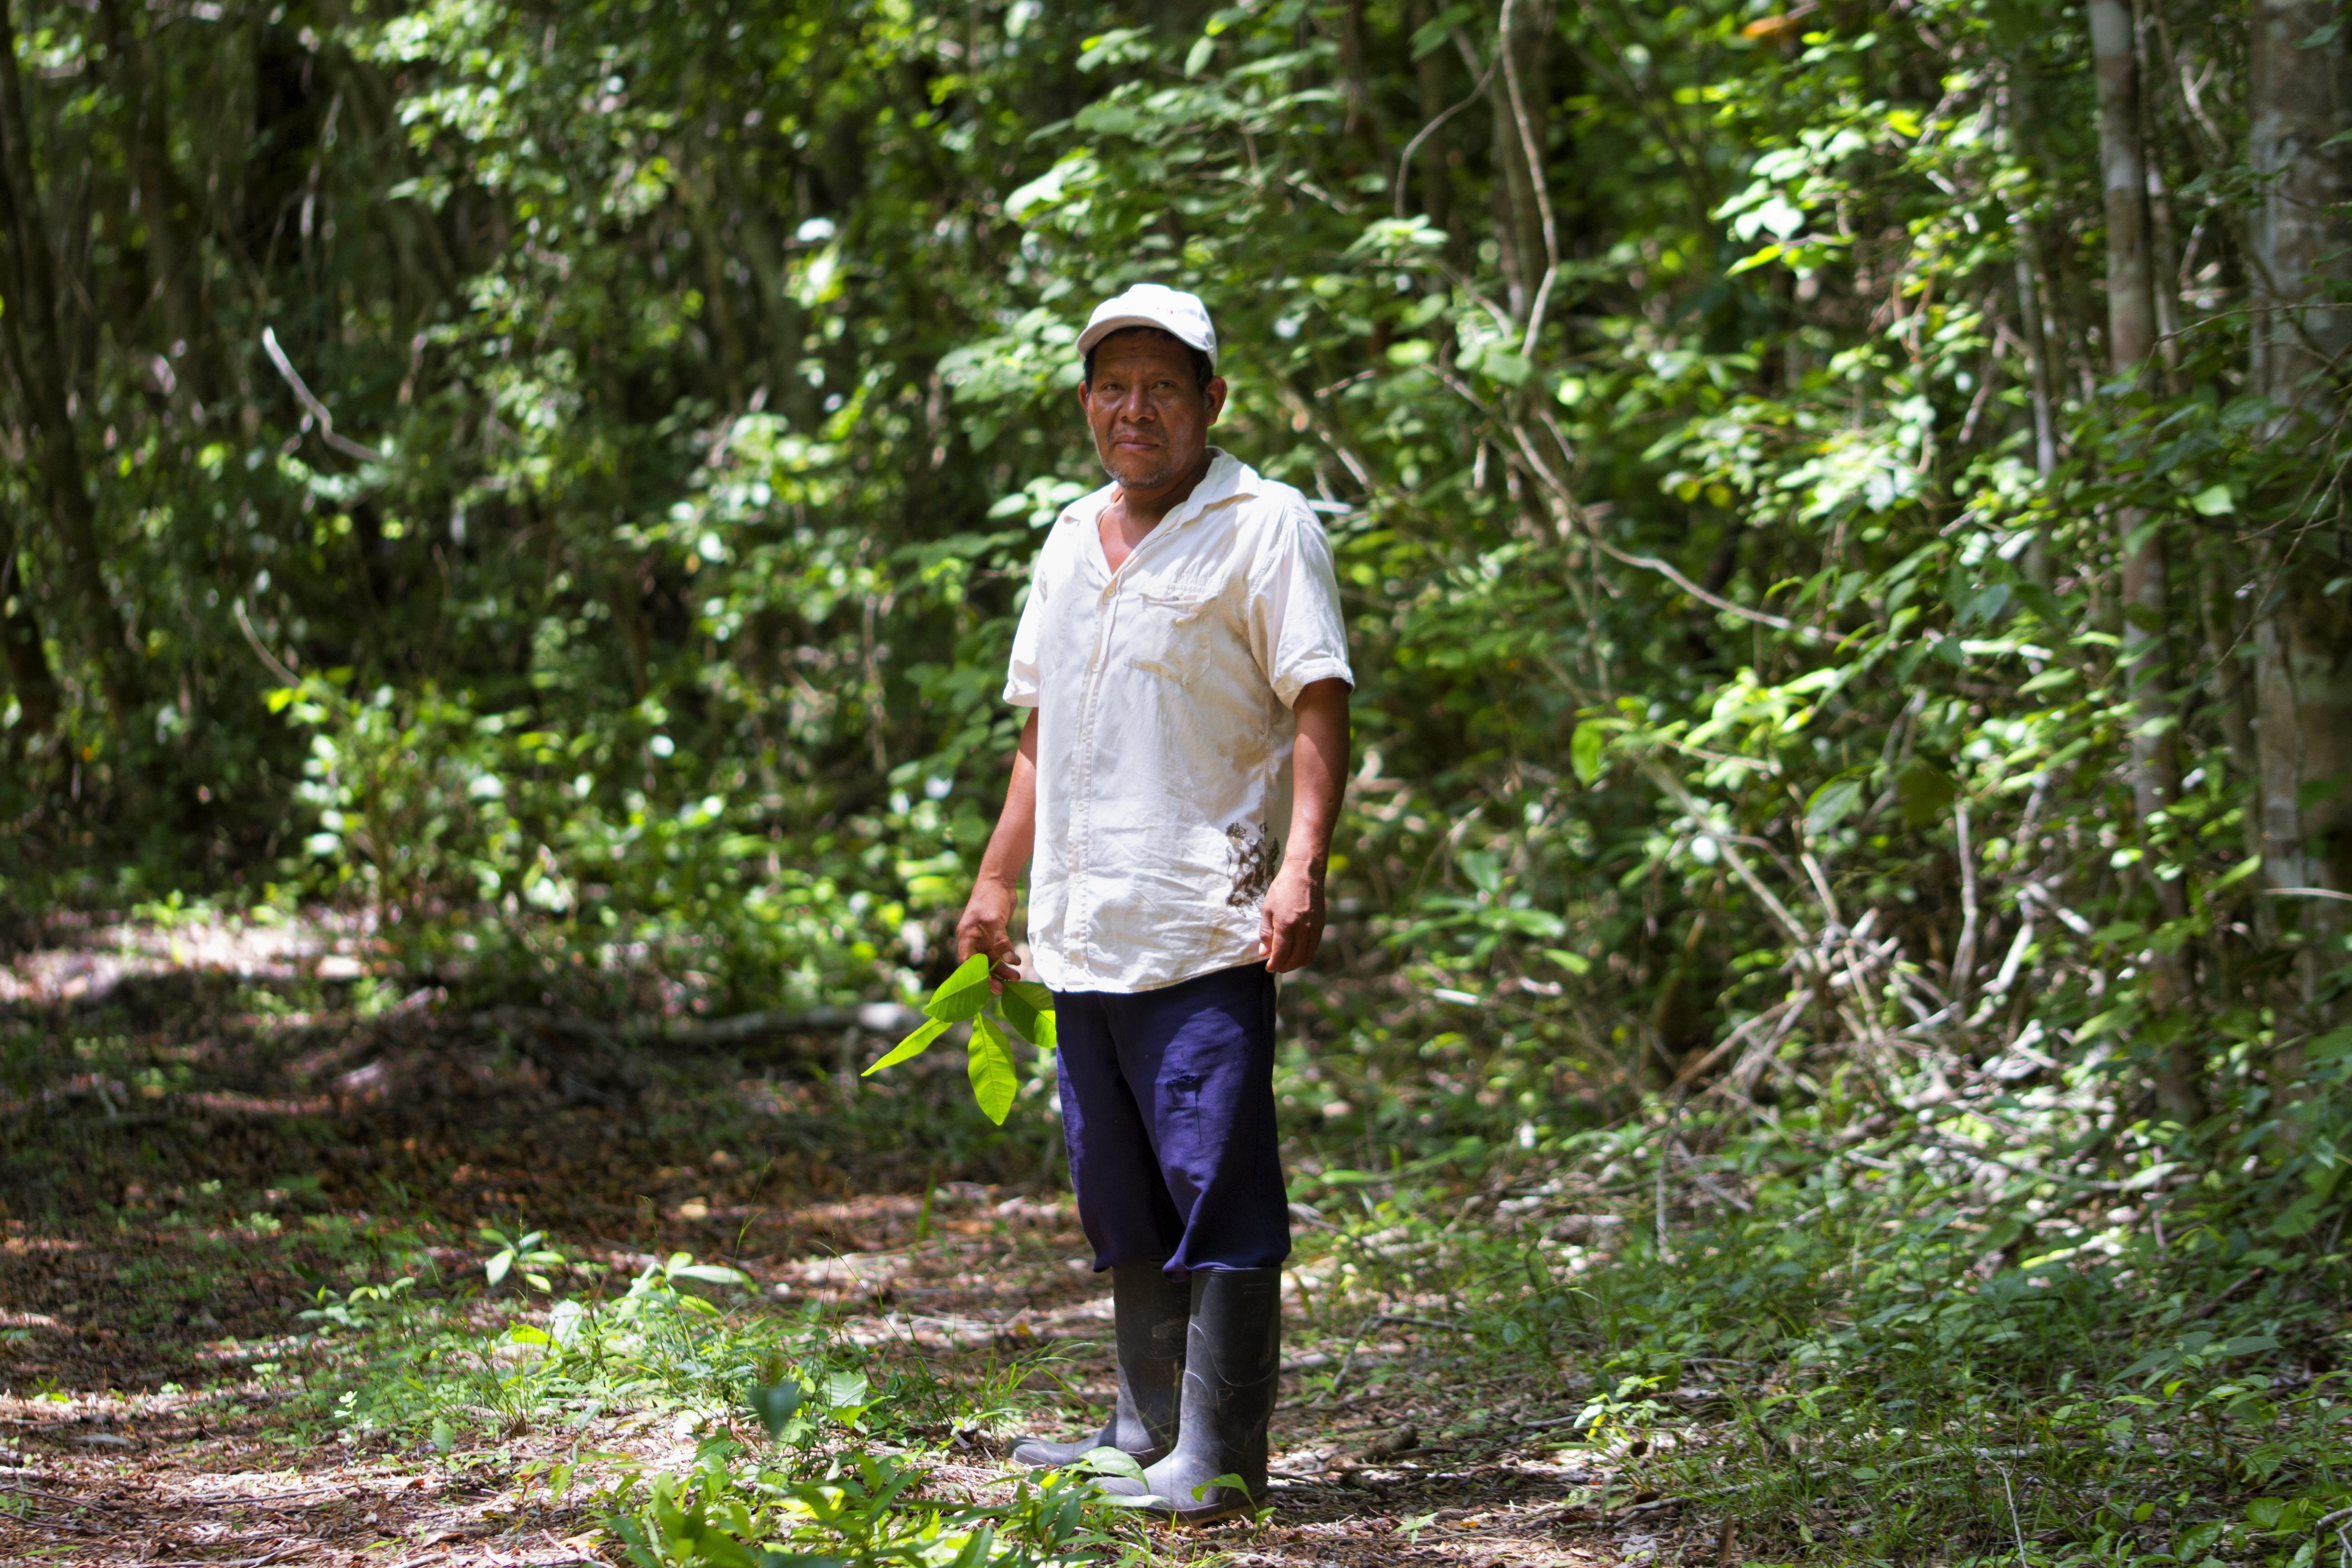 Acahual en Ejido Nuevo Becal, Quintana Roo